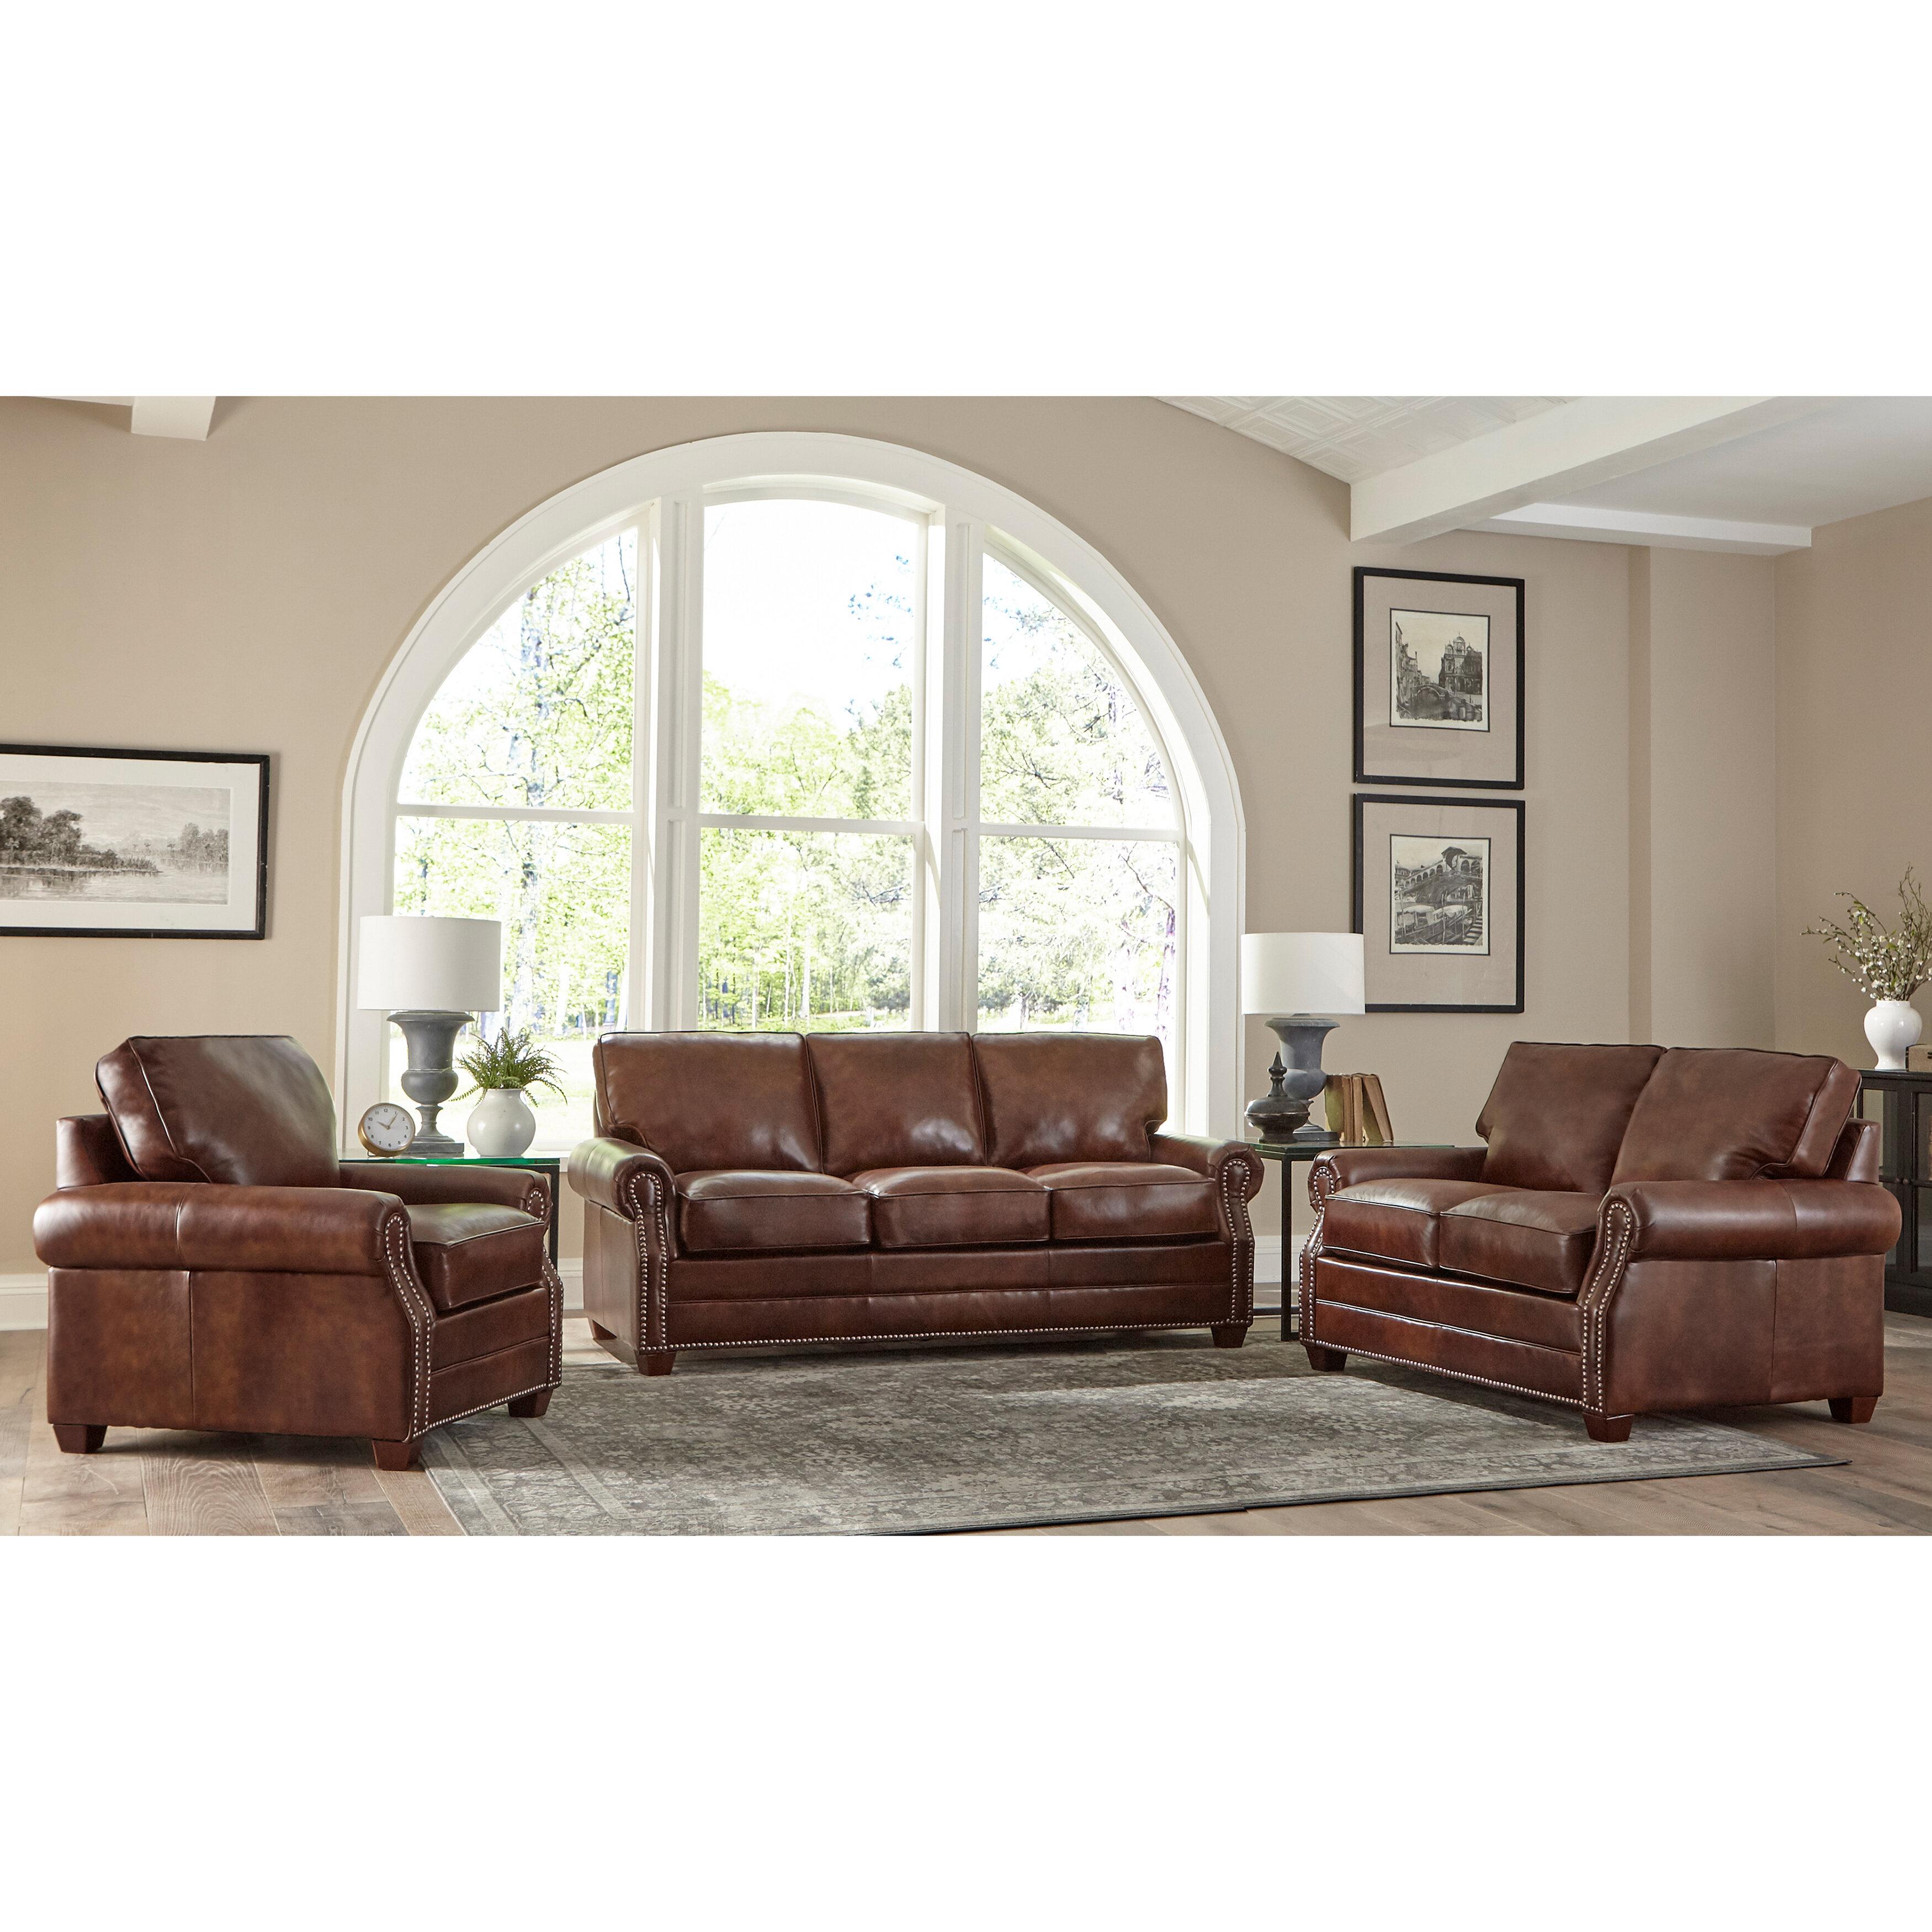 Lyndsey 3 Piece Leather Living Room Set